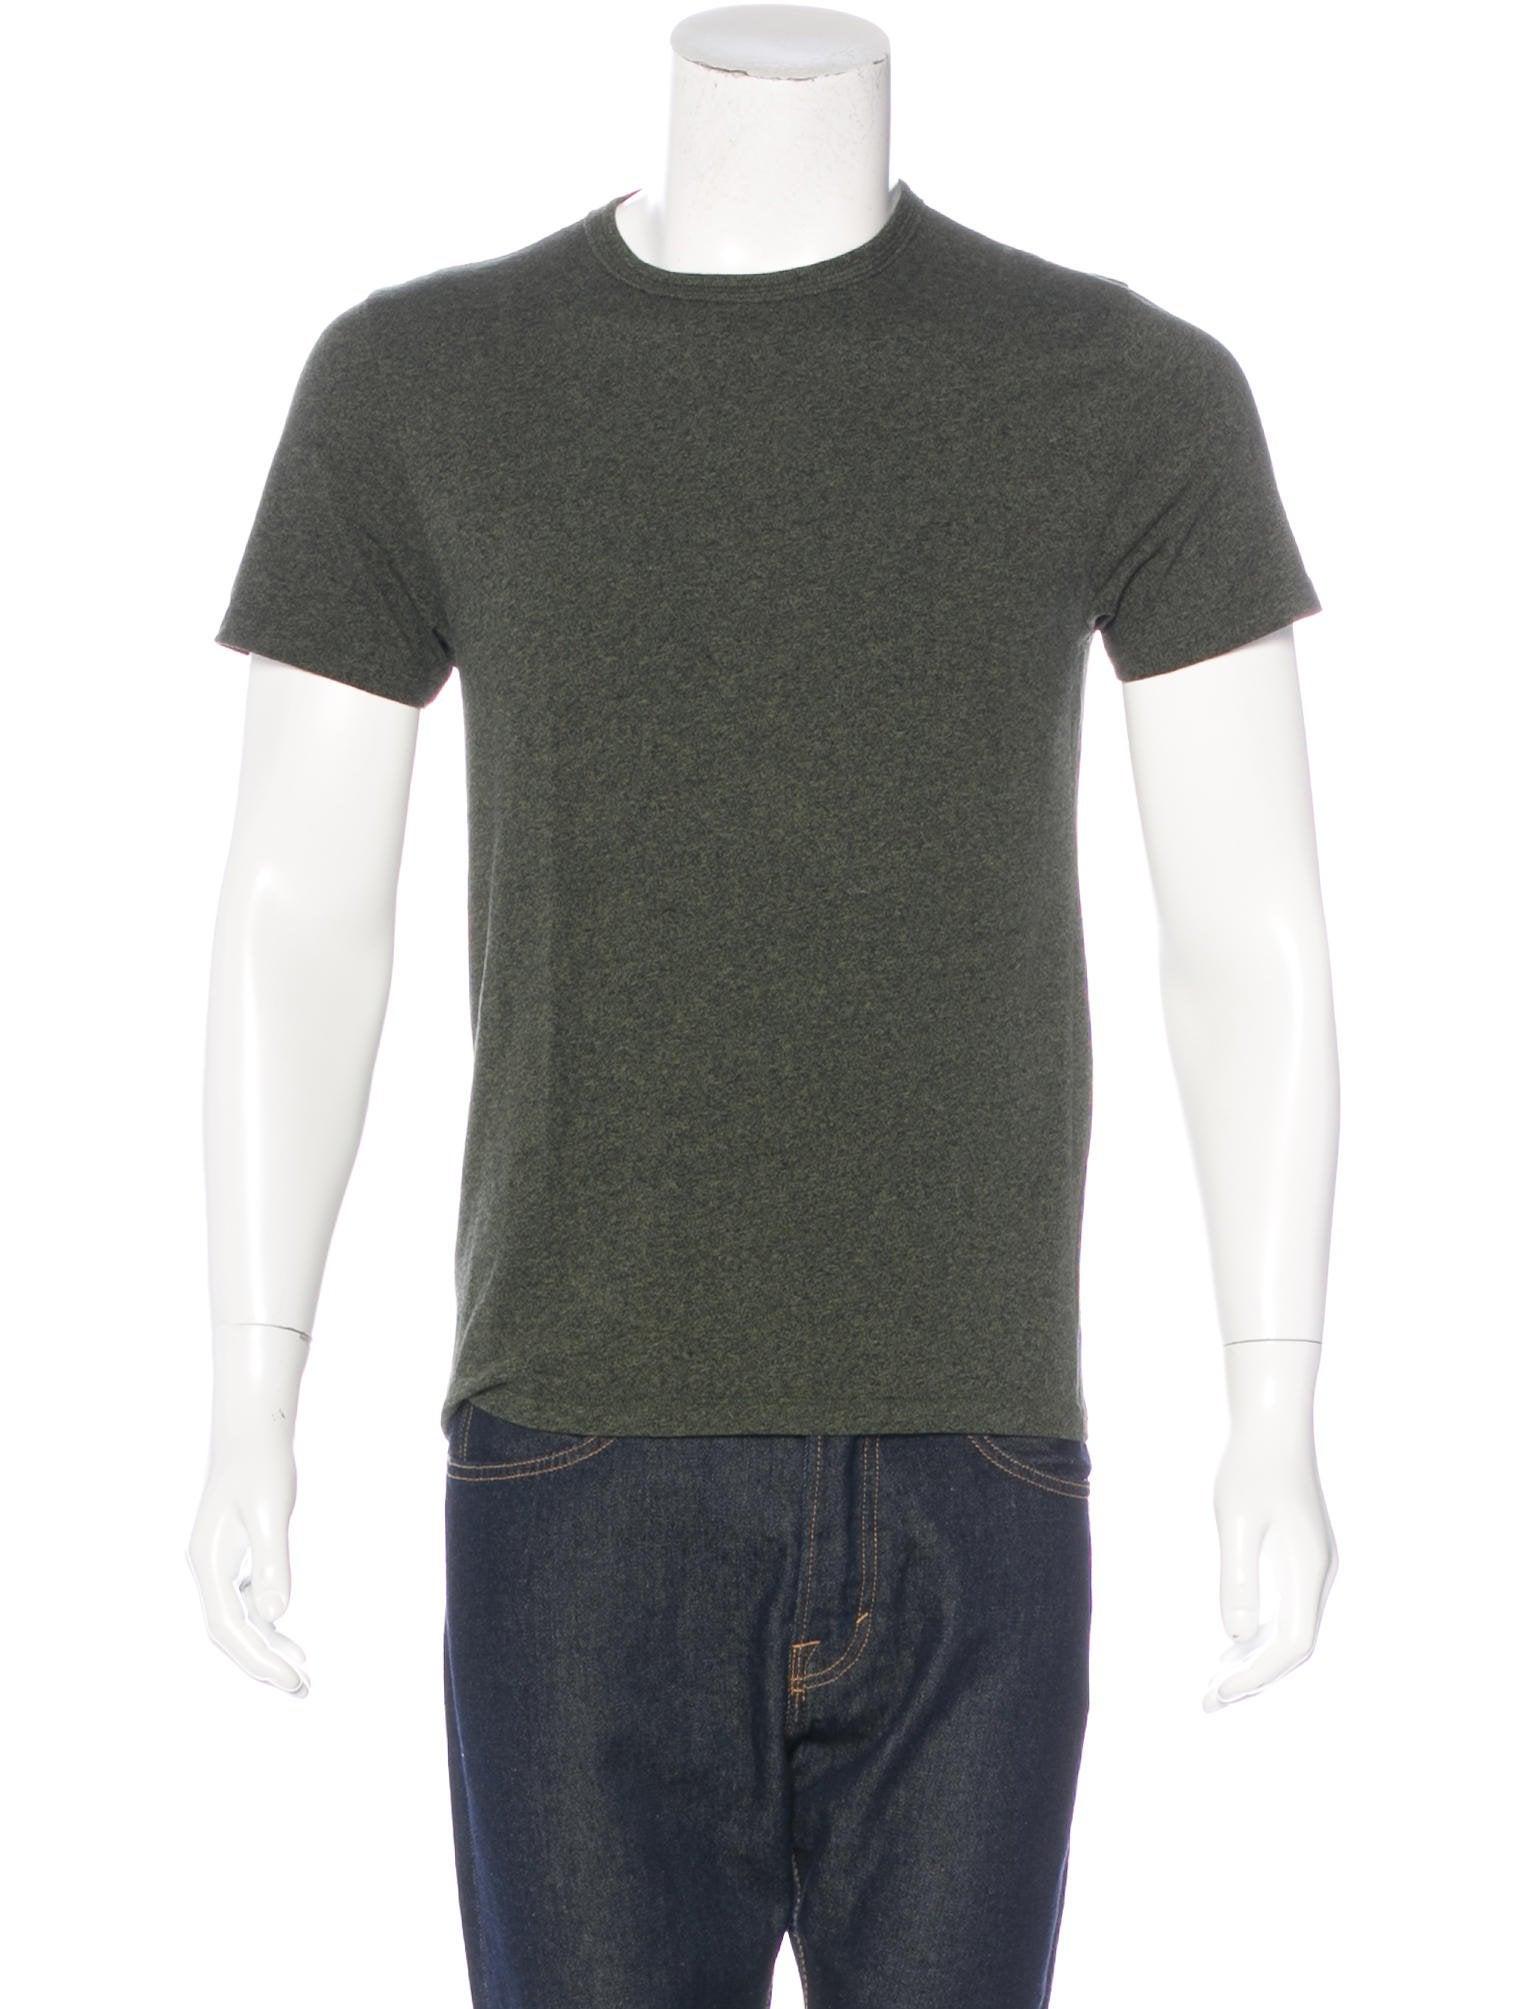 Rag Bone Crew Neck T Shirt Clothing Wragb71237 The